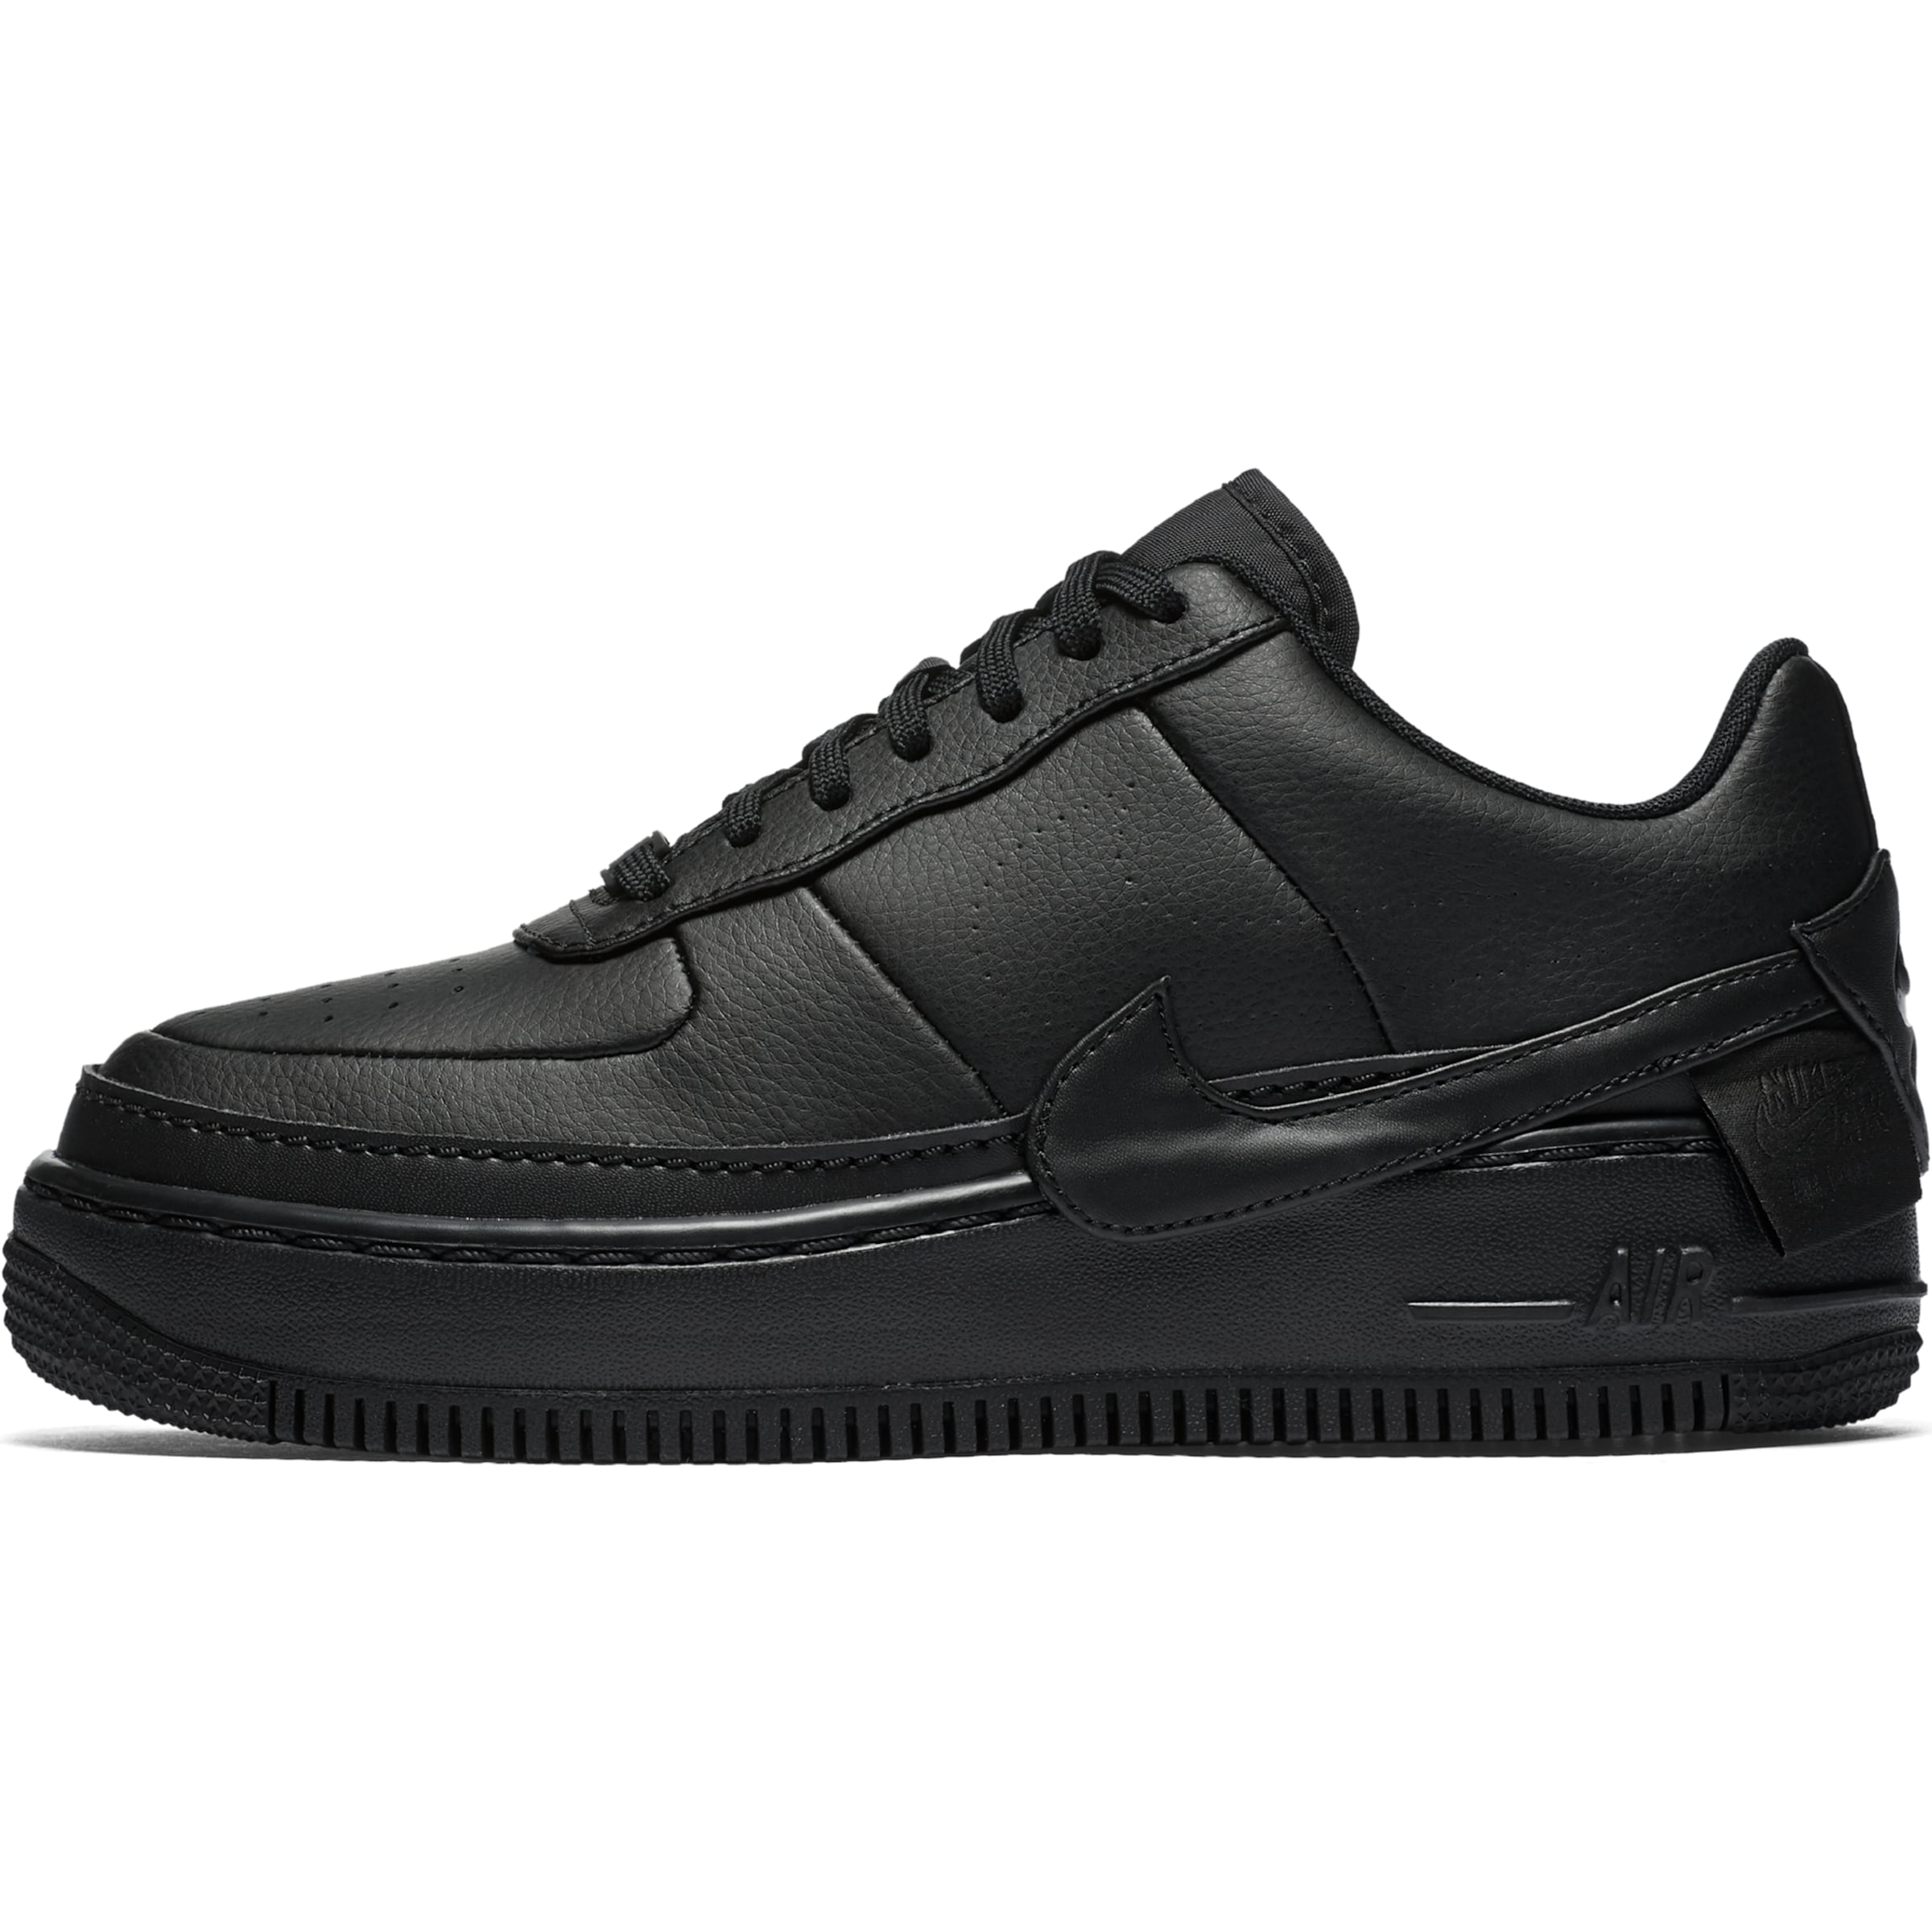 Nike Sportswear | Turnschuhe Jester Nike Air Force 1 Jester Turnschuhe XX 382438